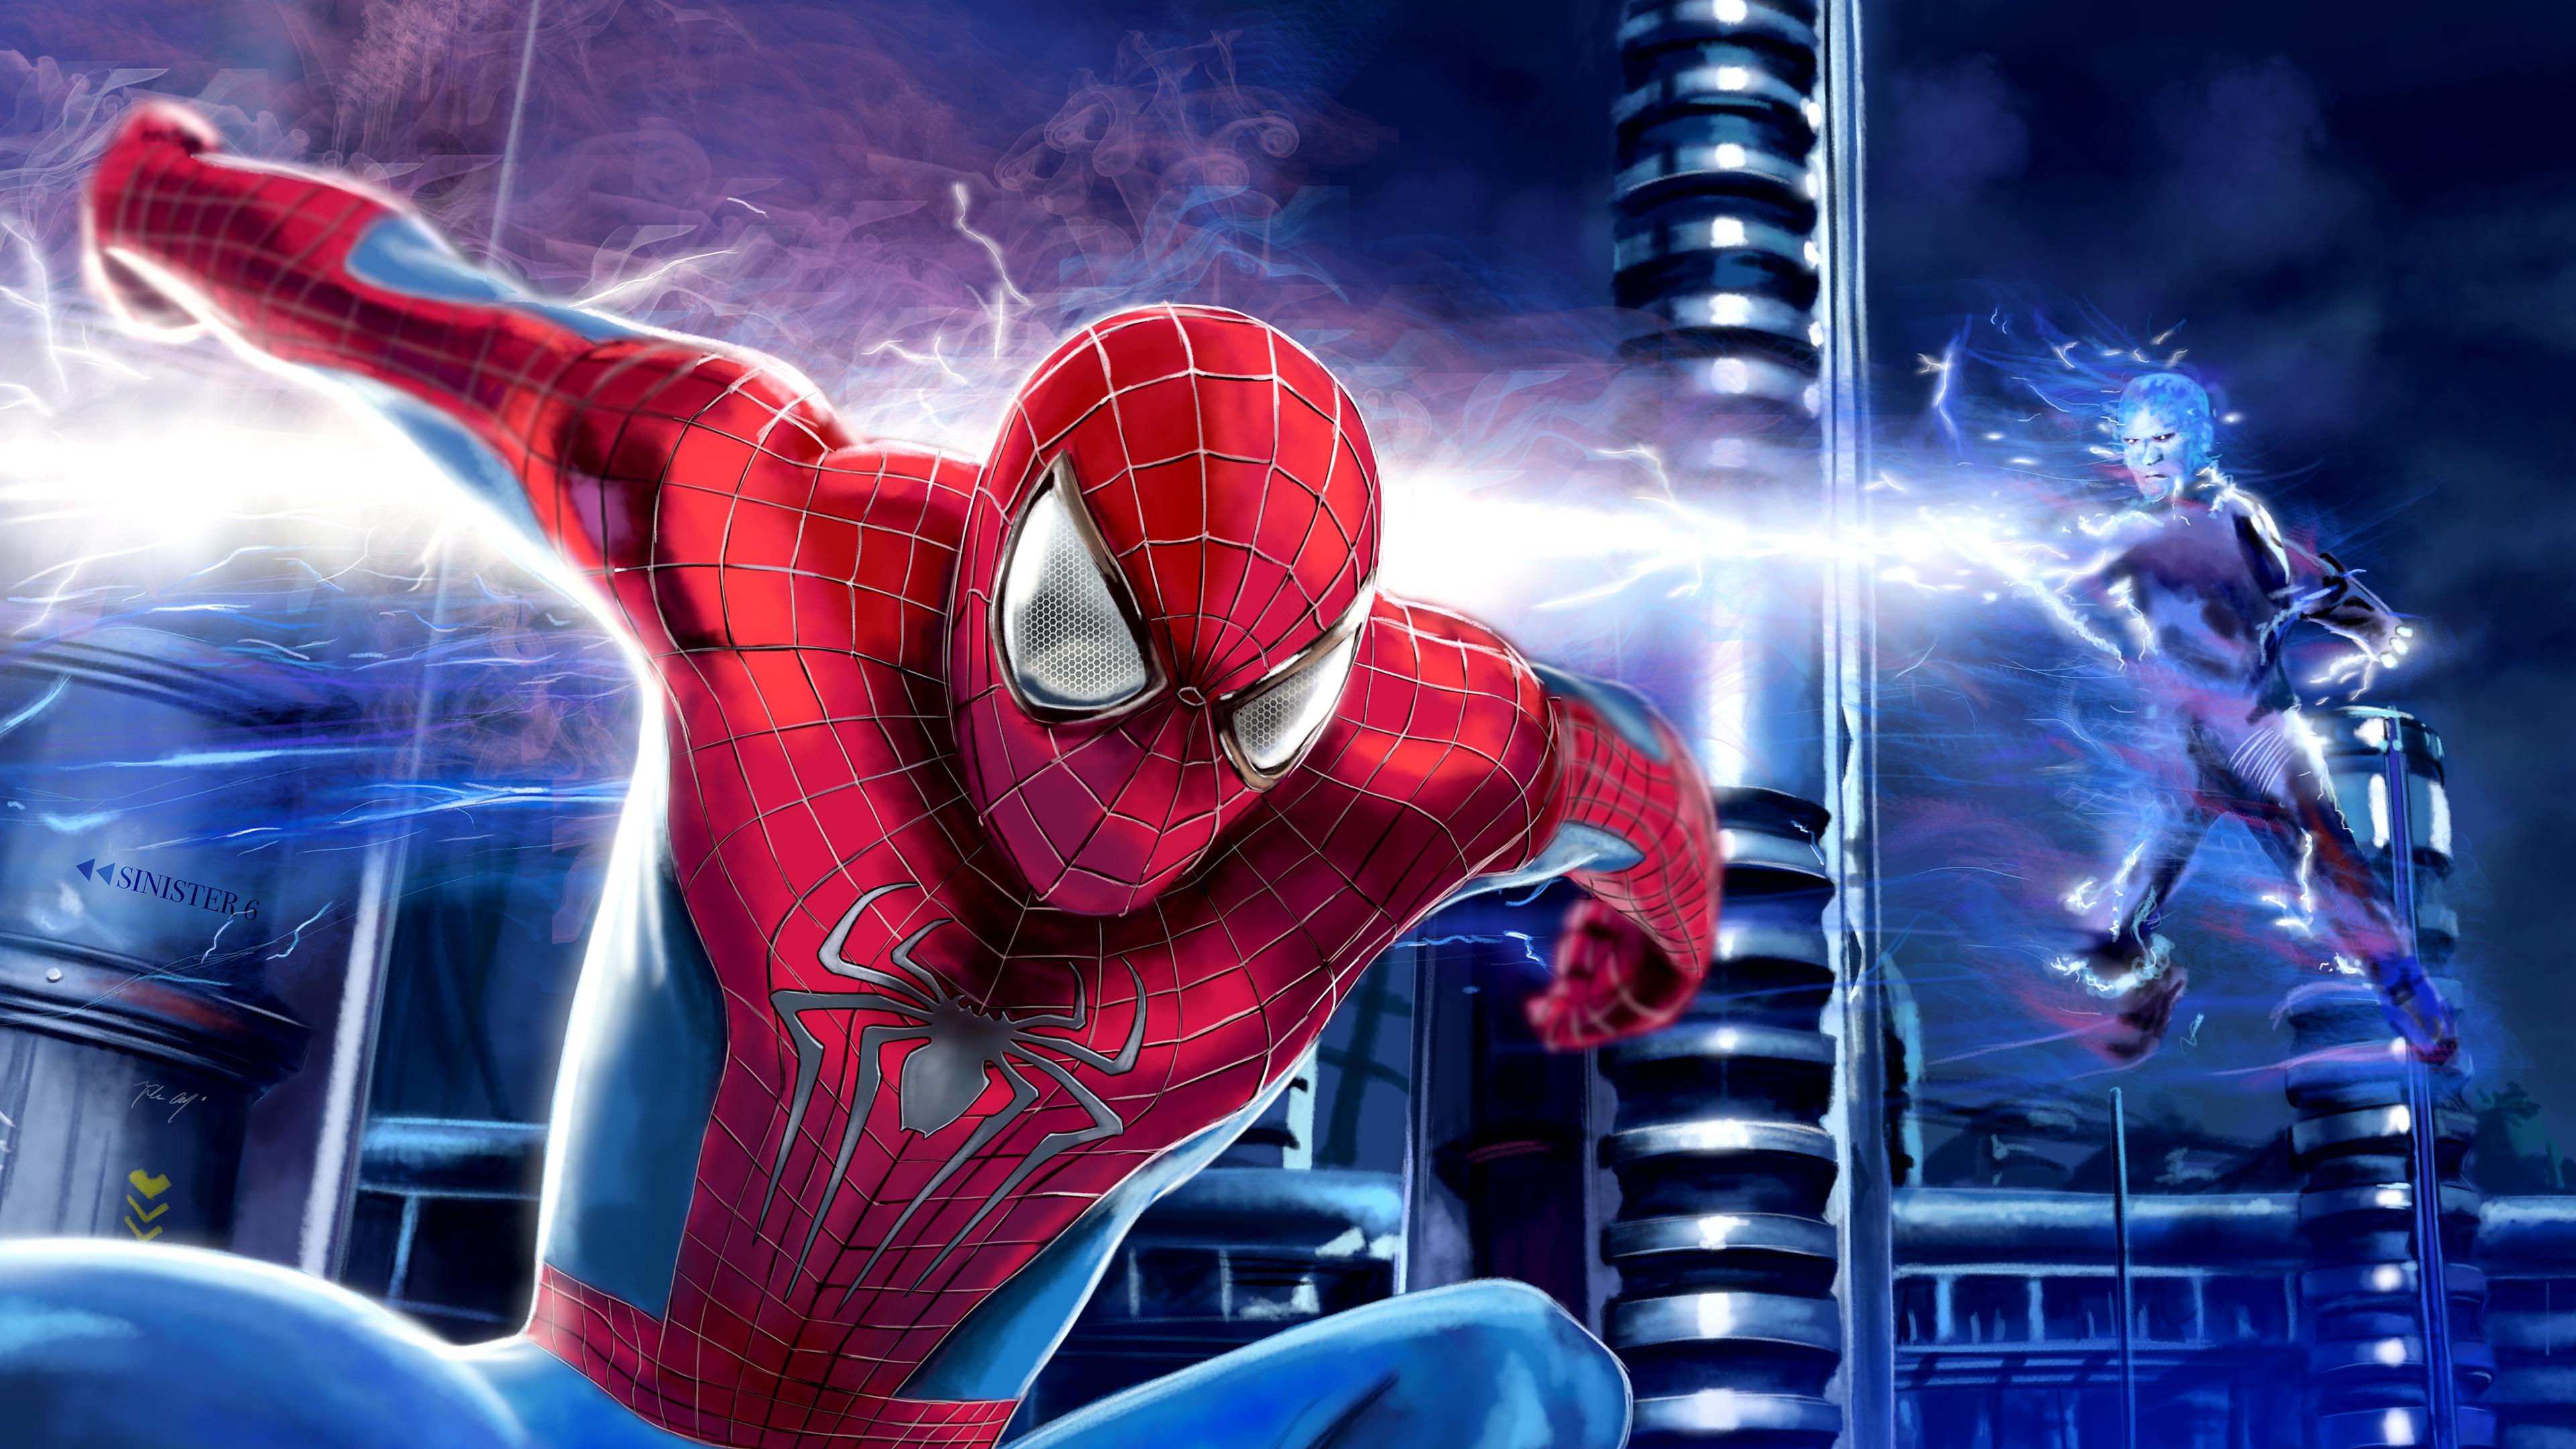 the amazing spiderman paint art 4k 1556184892 - The Amazing Spiderman Paint Art 4k - superheroes wallpapers, spiderman wallpapers, hd-wallpapers, digital art wallpapers, artwork wallpapers, 4k-wallpapers